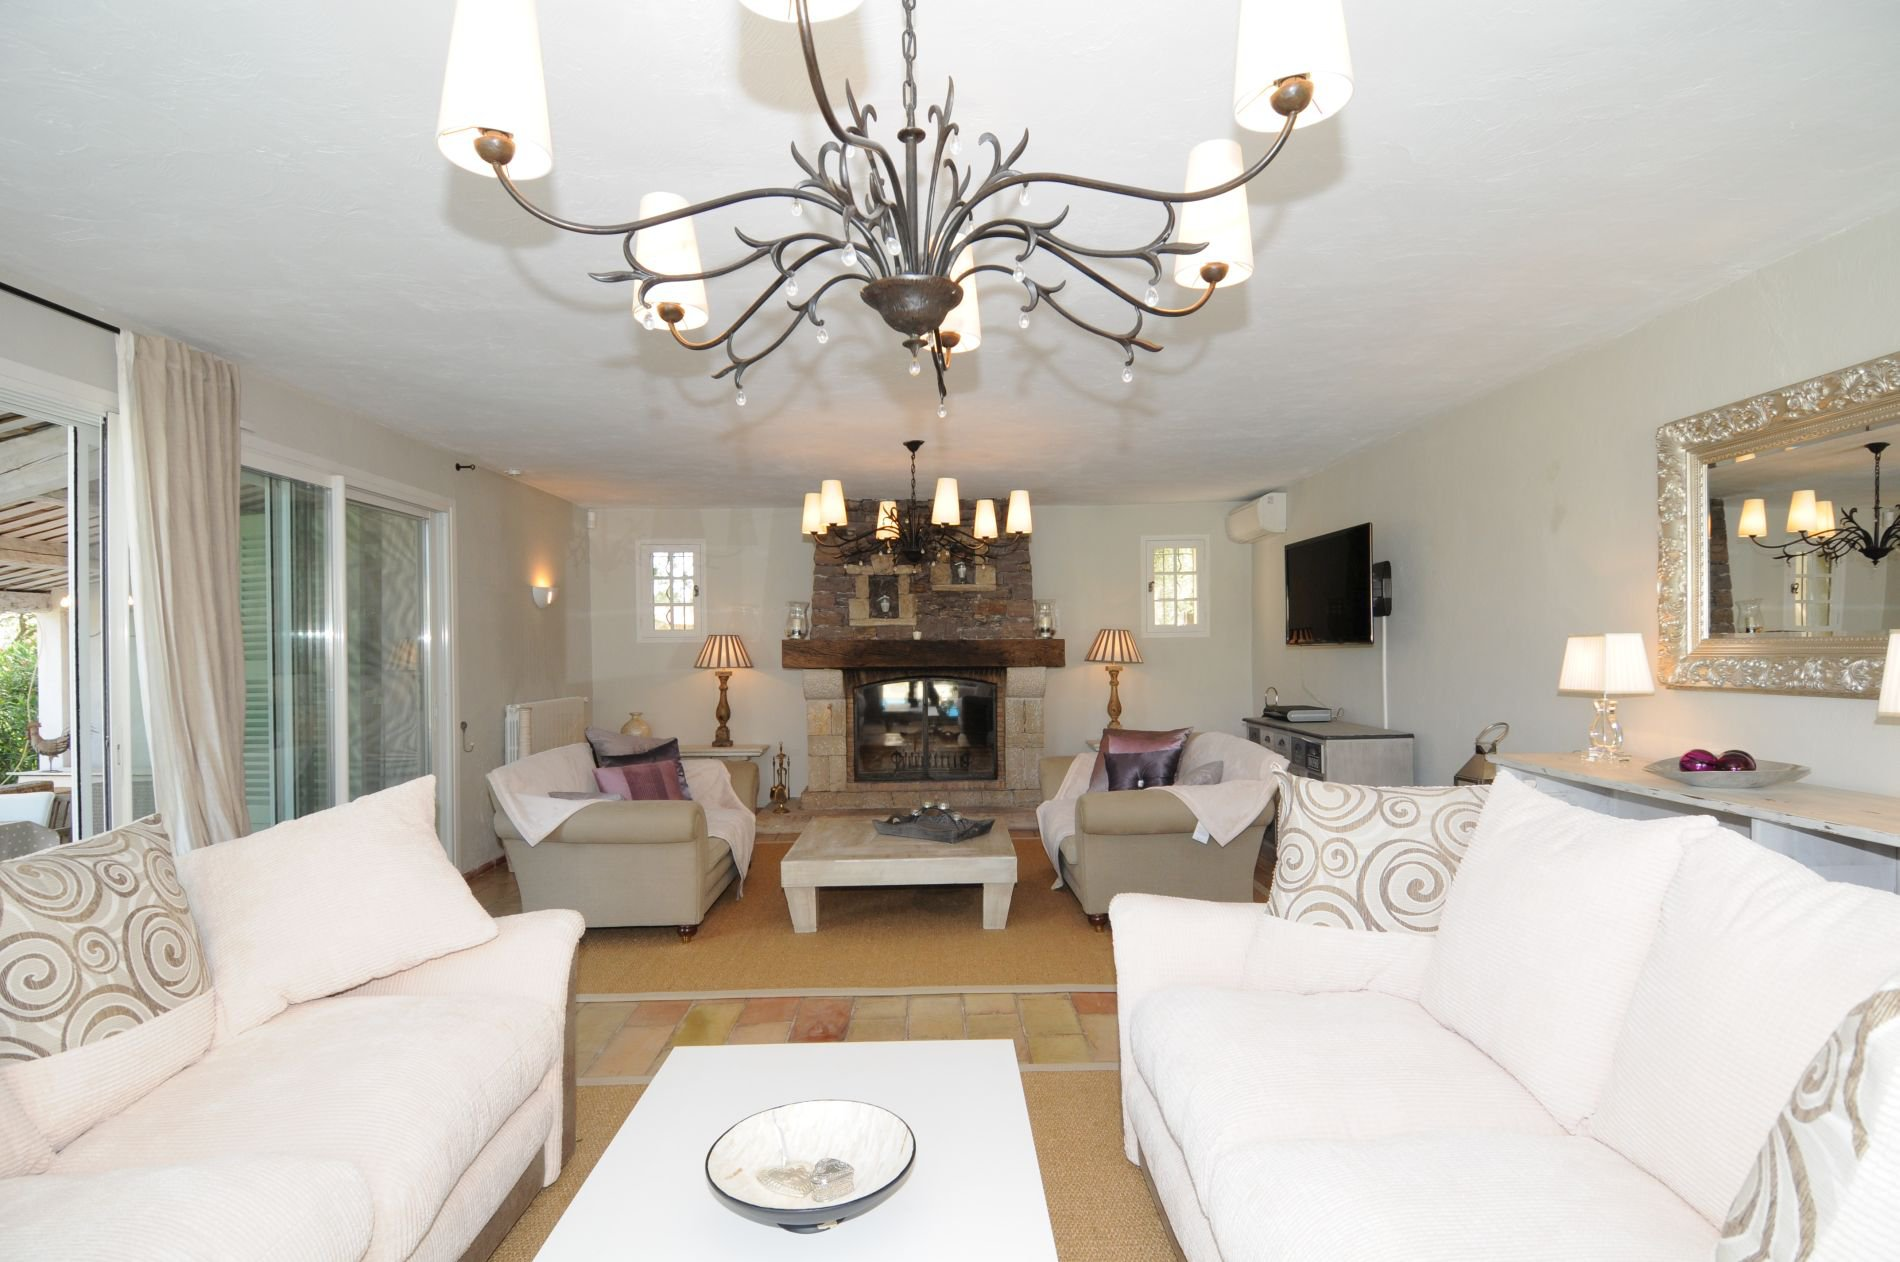 7 Bed Villa with Stunning Views near Valbonne